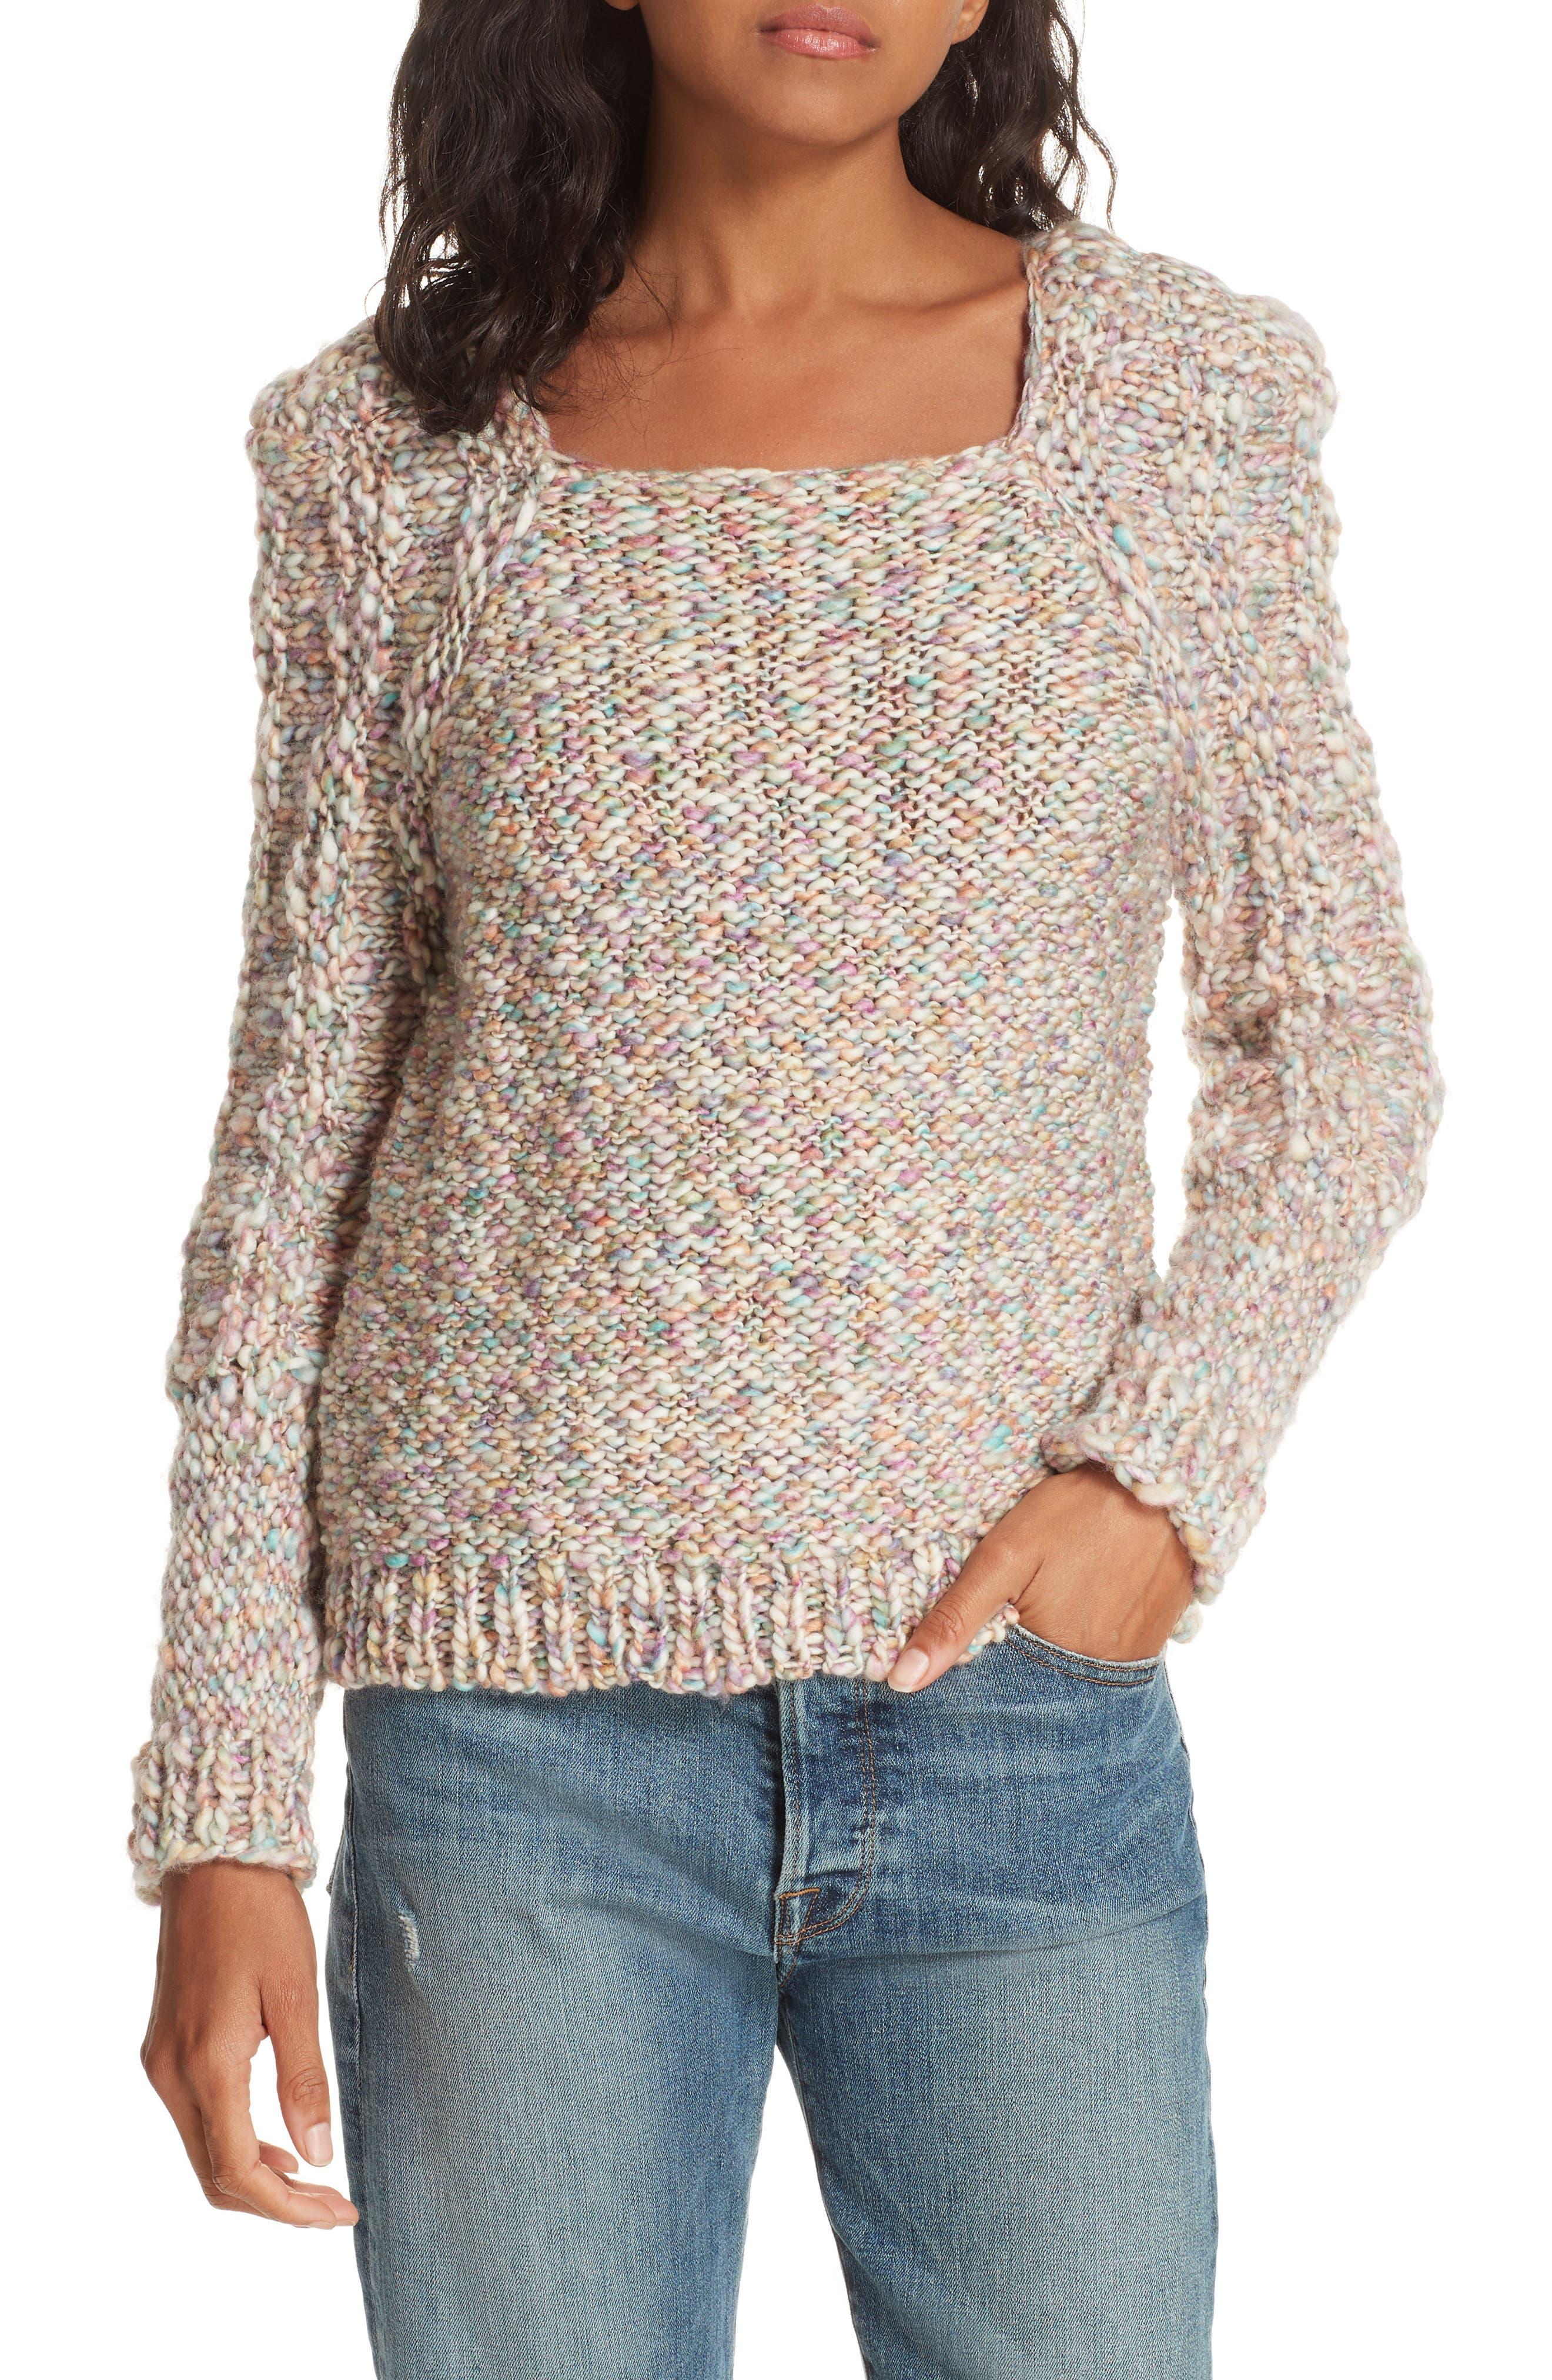 Joplin Wool Sweater,                             Main thumbnail 1, color,                             PASTEL MULTI